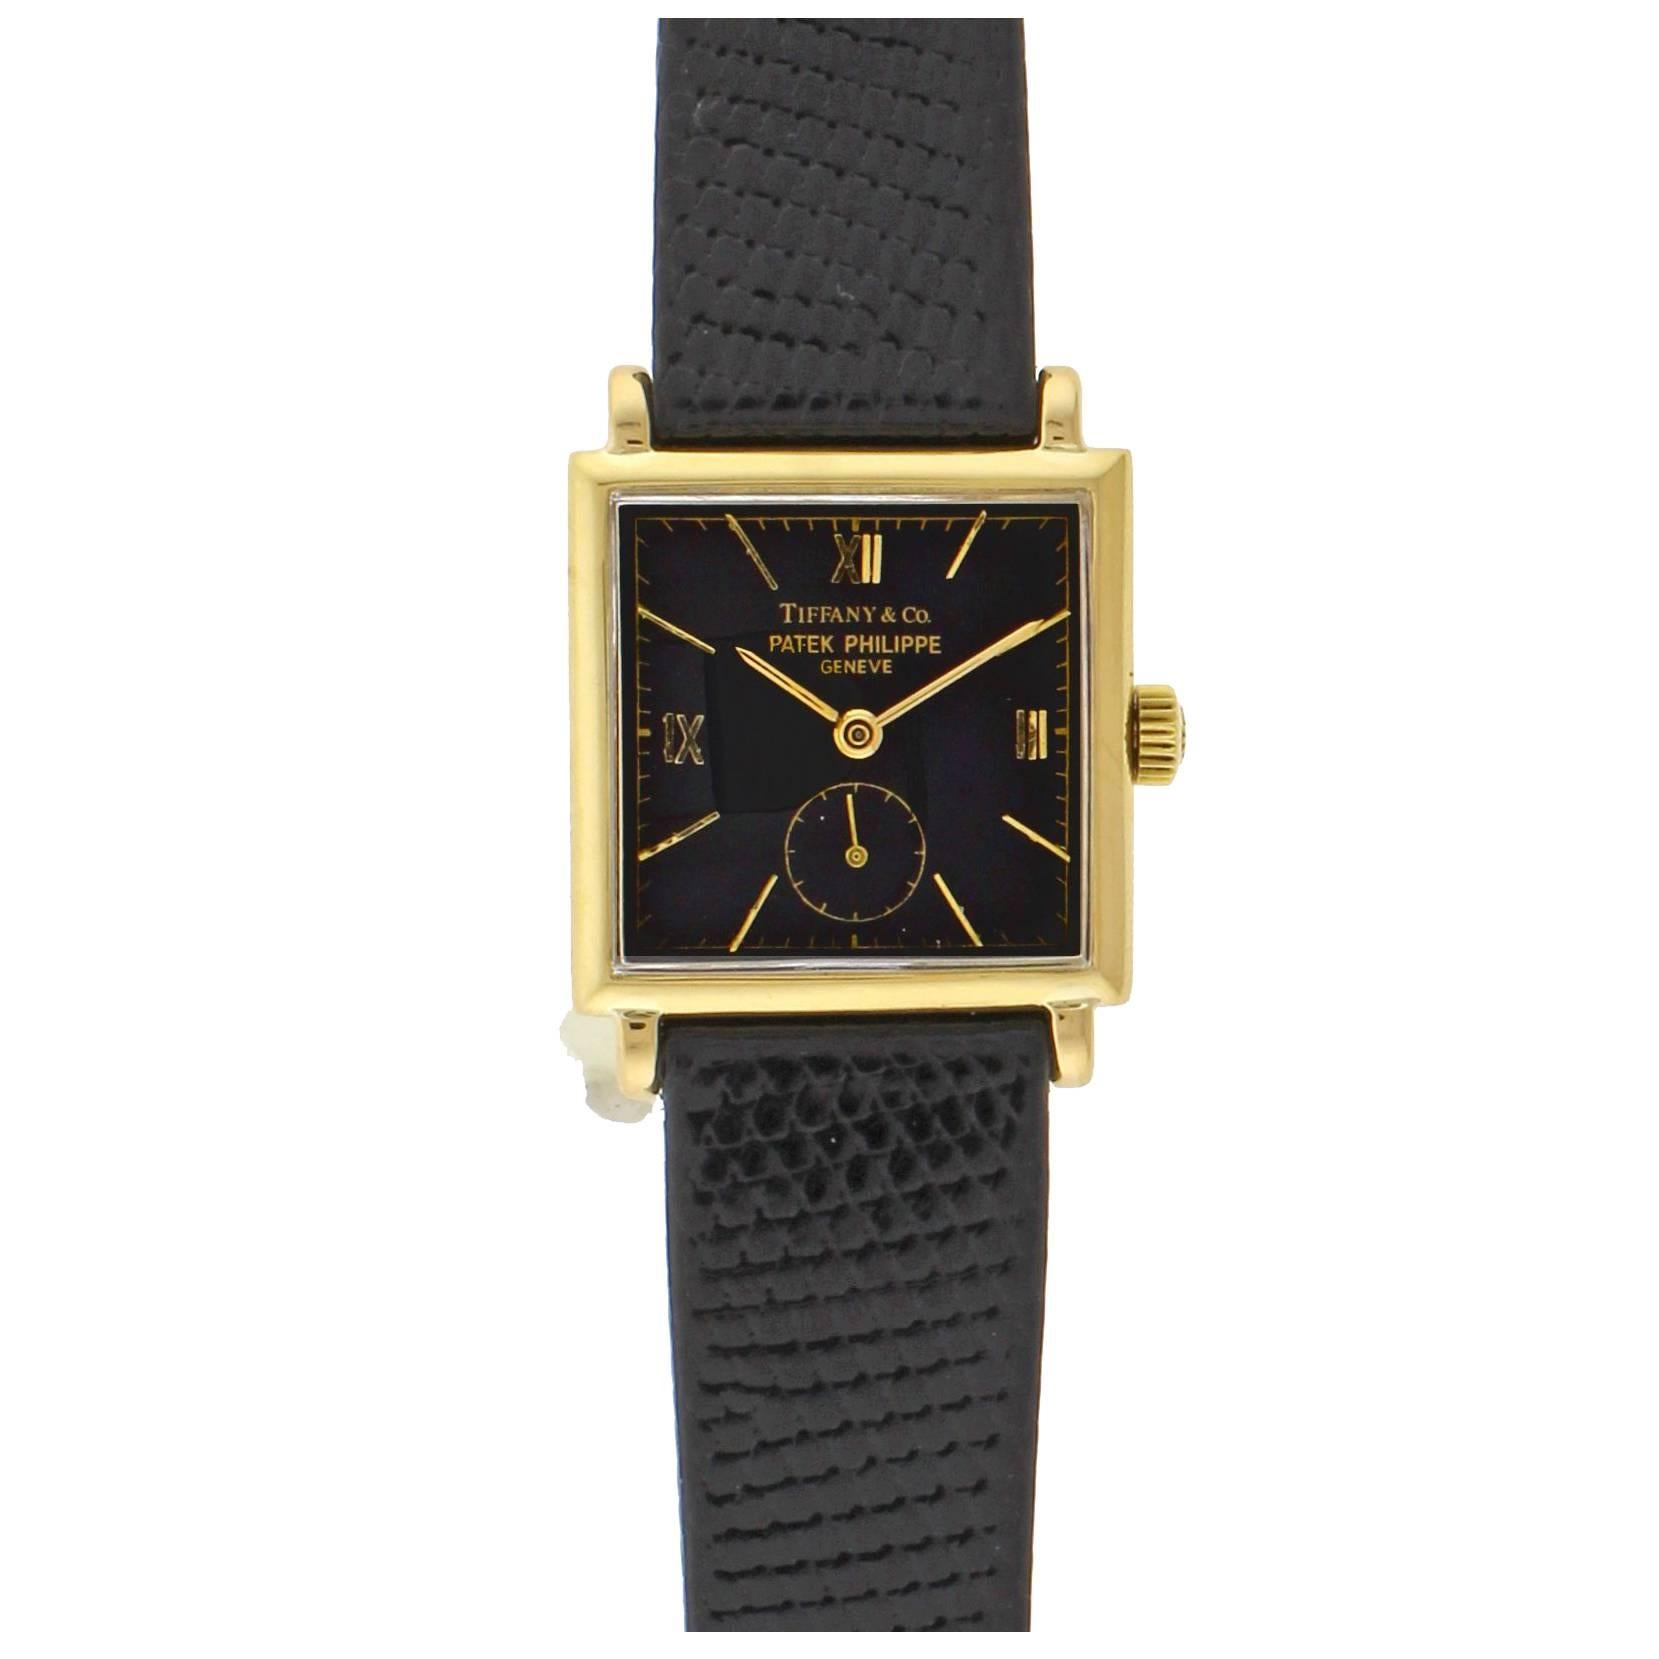 Patek Philippe Tiffany & Co. Yellow Gold Manual Wristwatch